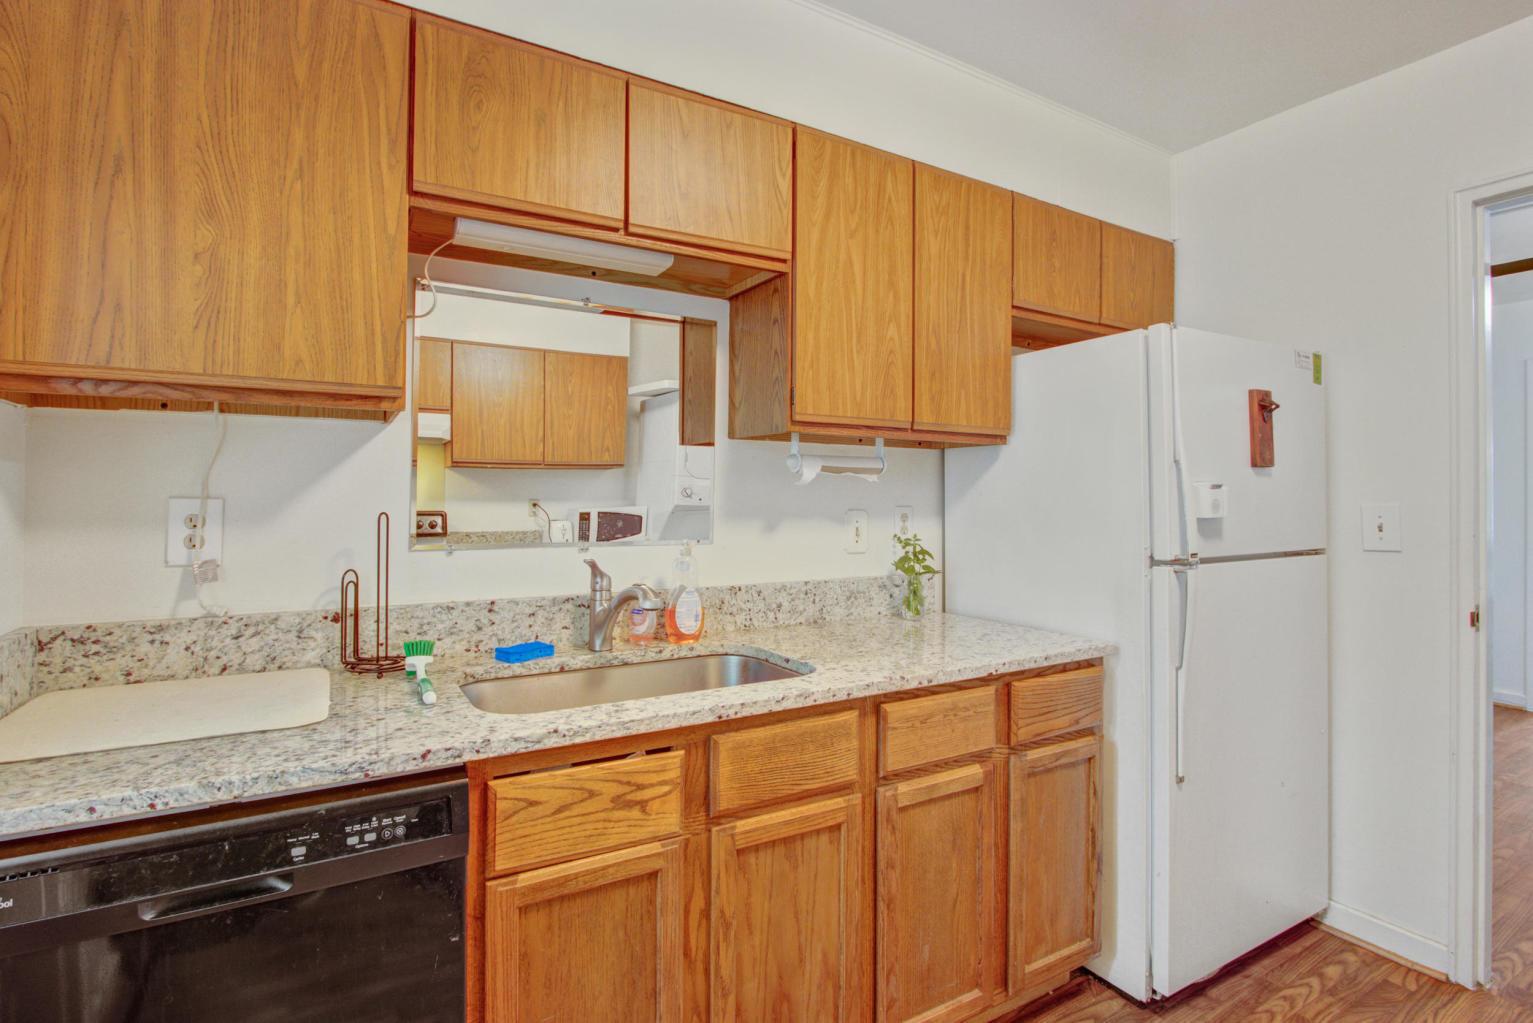 Rutledge Green Condos For Sale - 173 Rutledge, Charleston, SC - 17